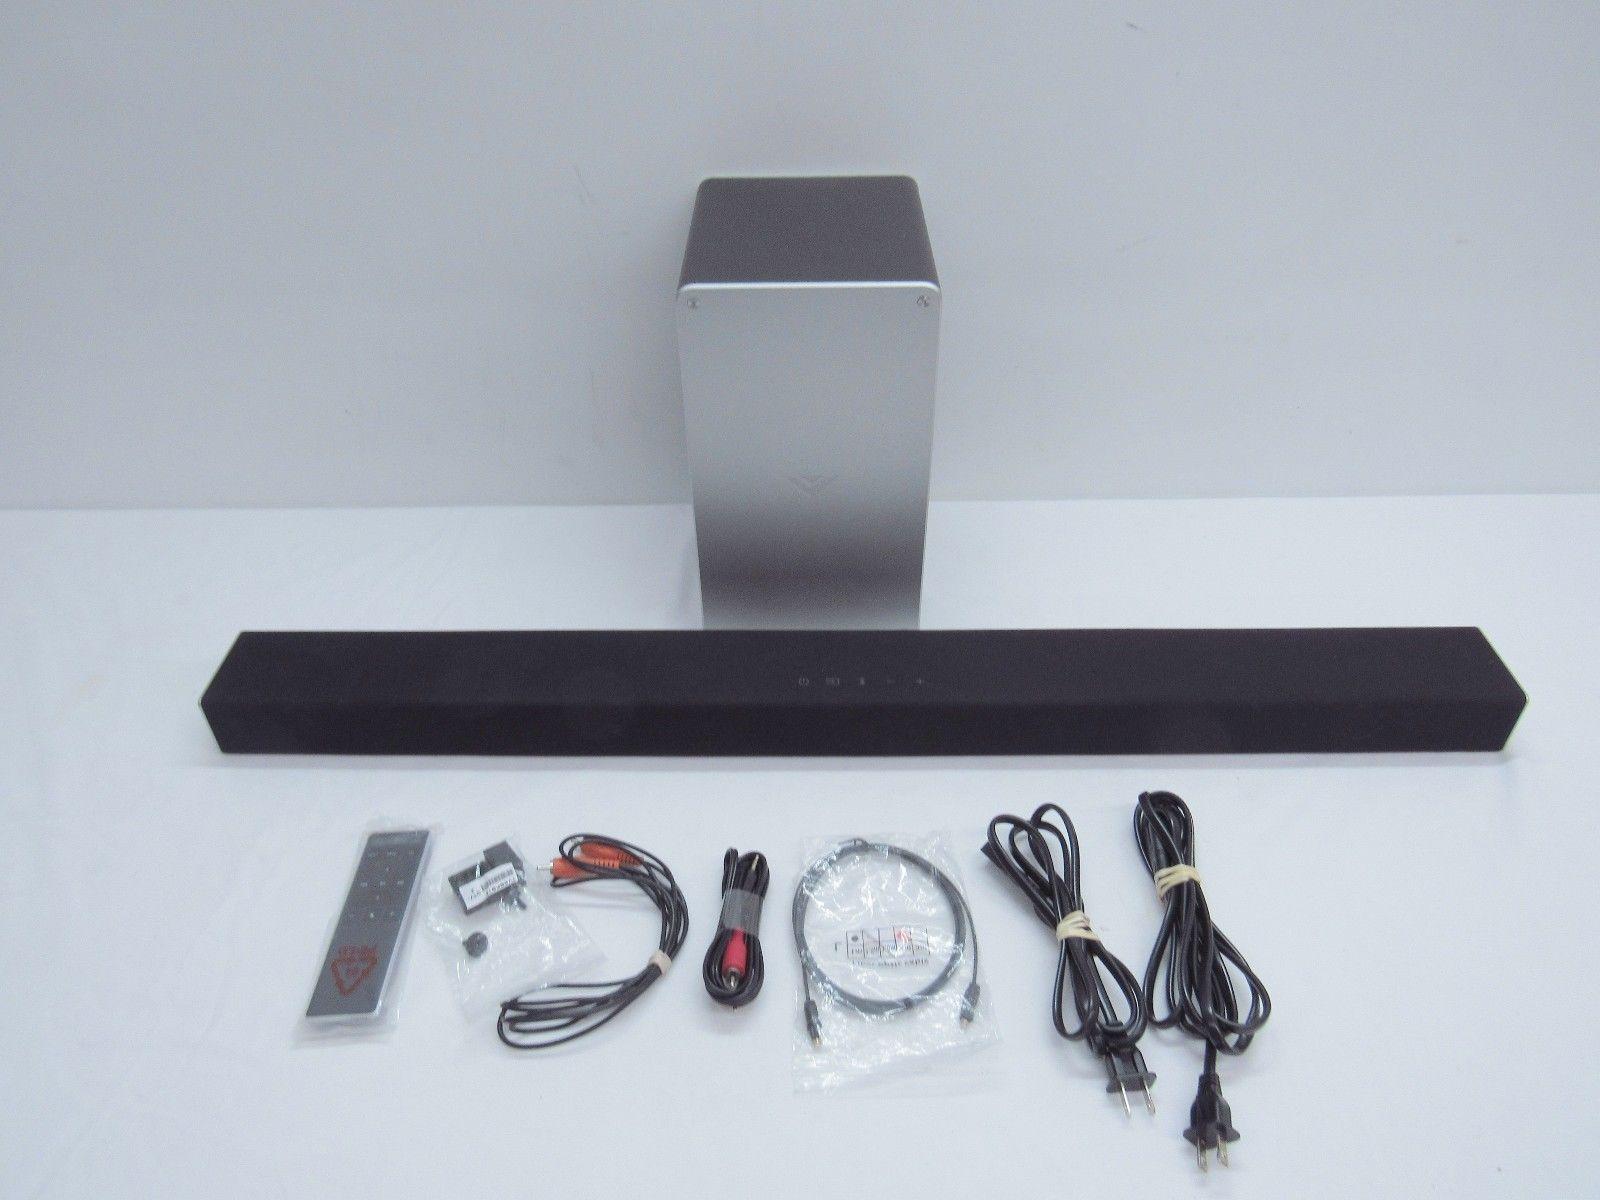 VIZIO SB3621n-E8M 36 2.1 Sound Bar System Black   Shopping Deals ...